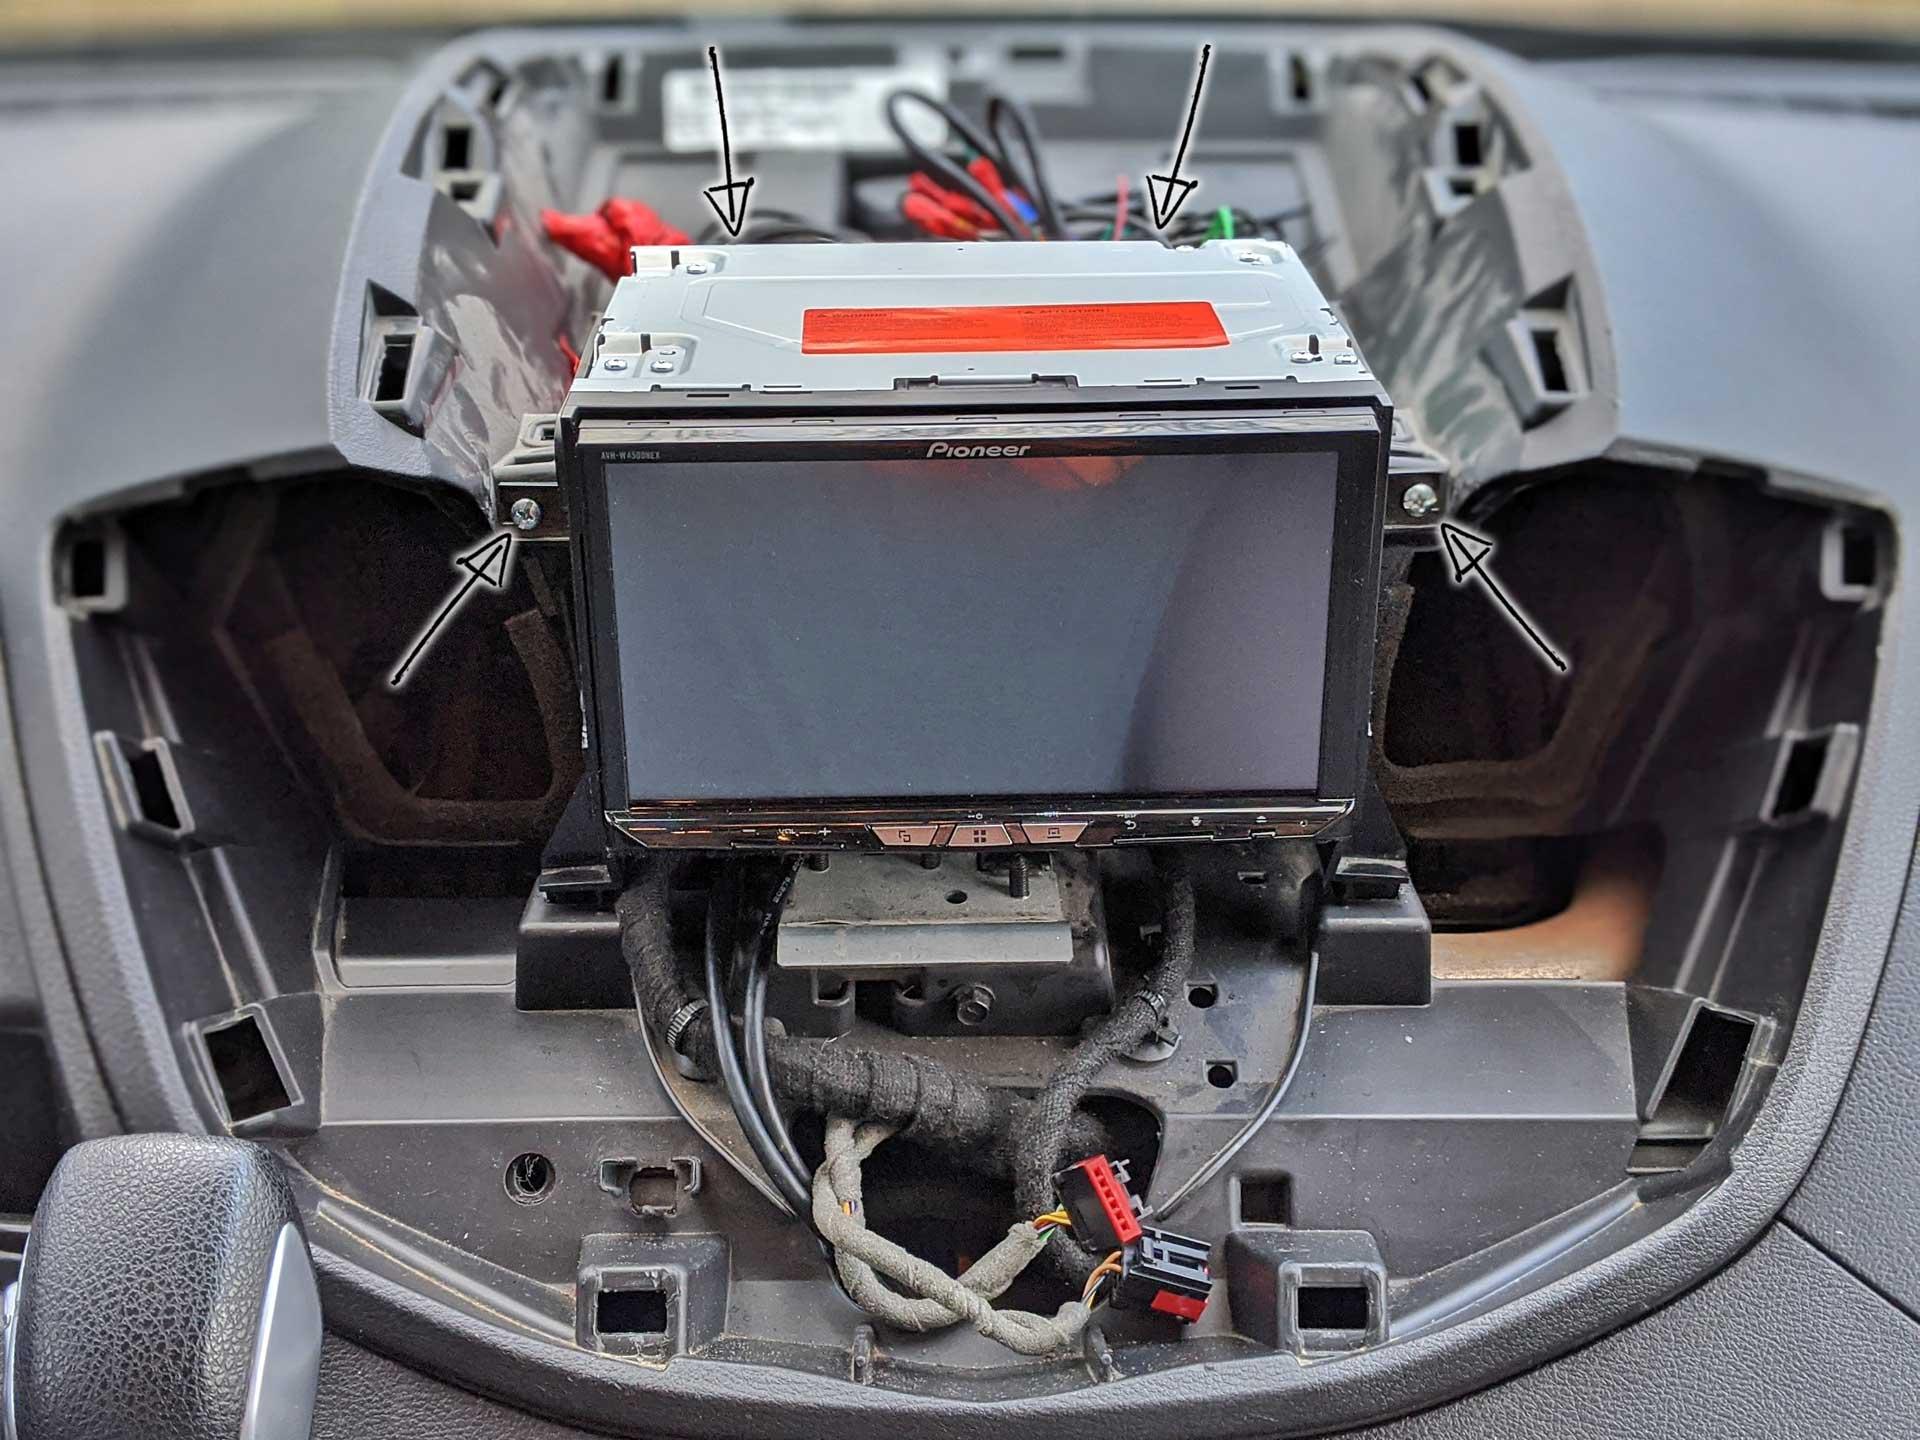 Ford Transit DIY Aftermarket Radio Installation (Pioneer Android/CarPlay) |  FarOutRideFarOutRide.com